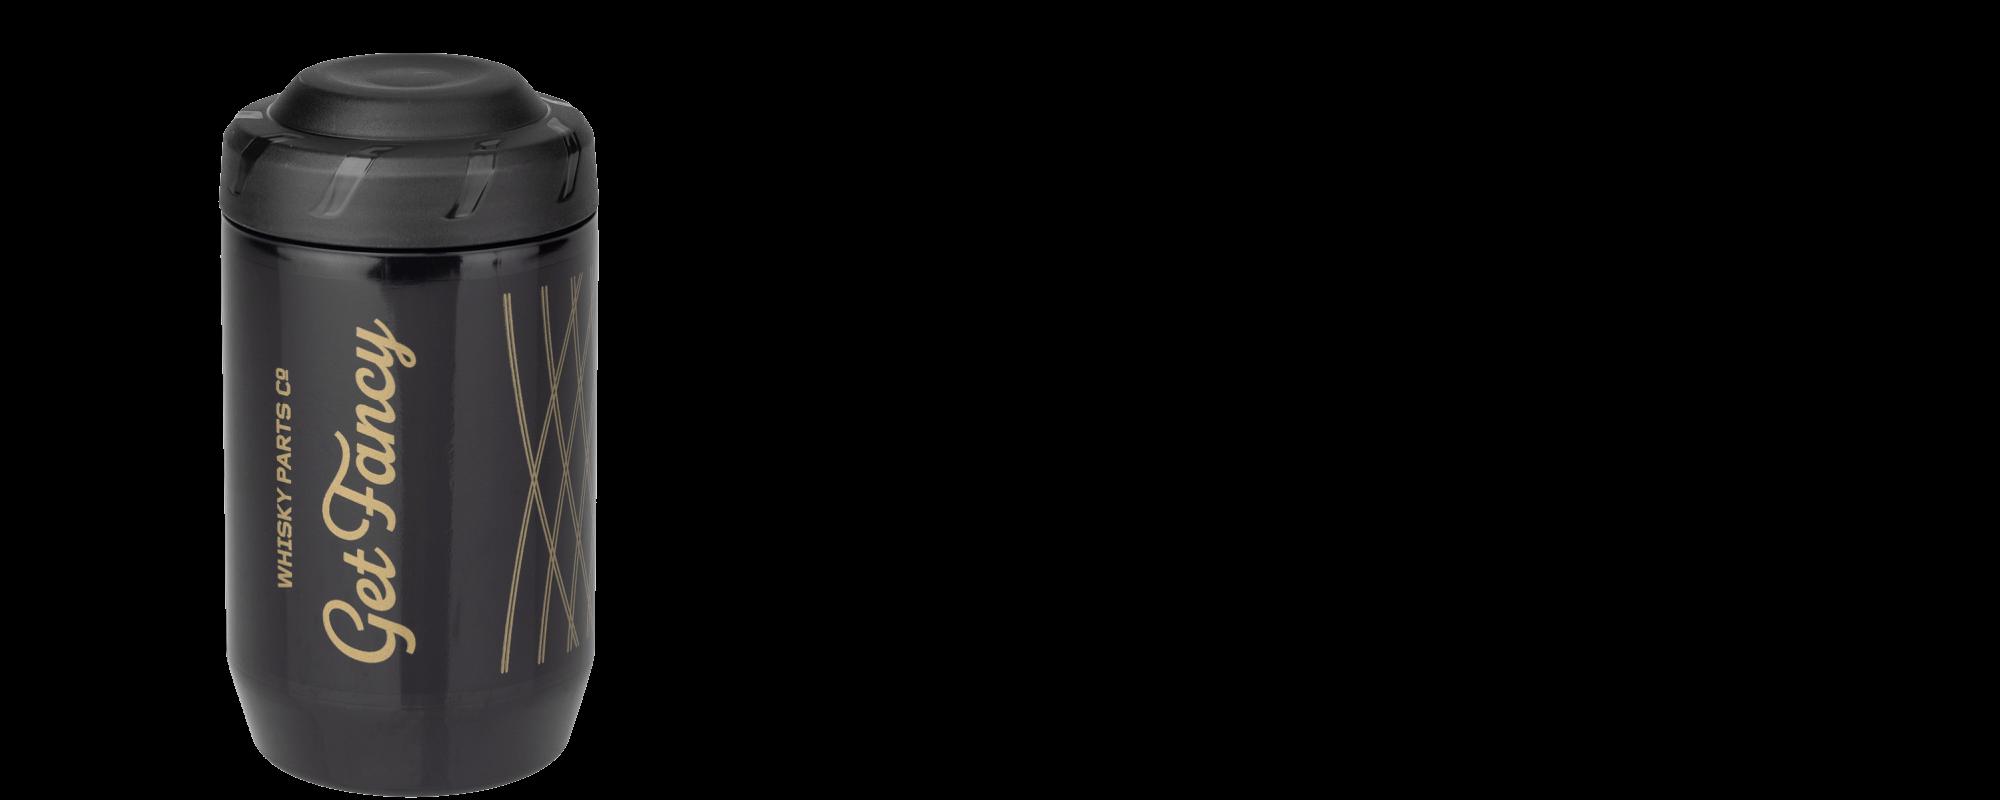 Whisky Prospector Keg - Black/Gold - front